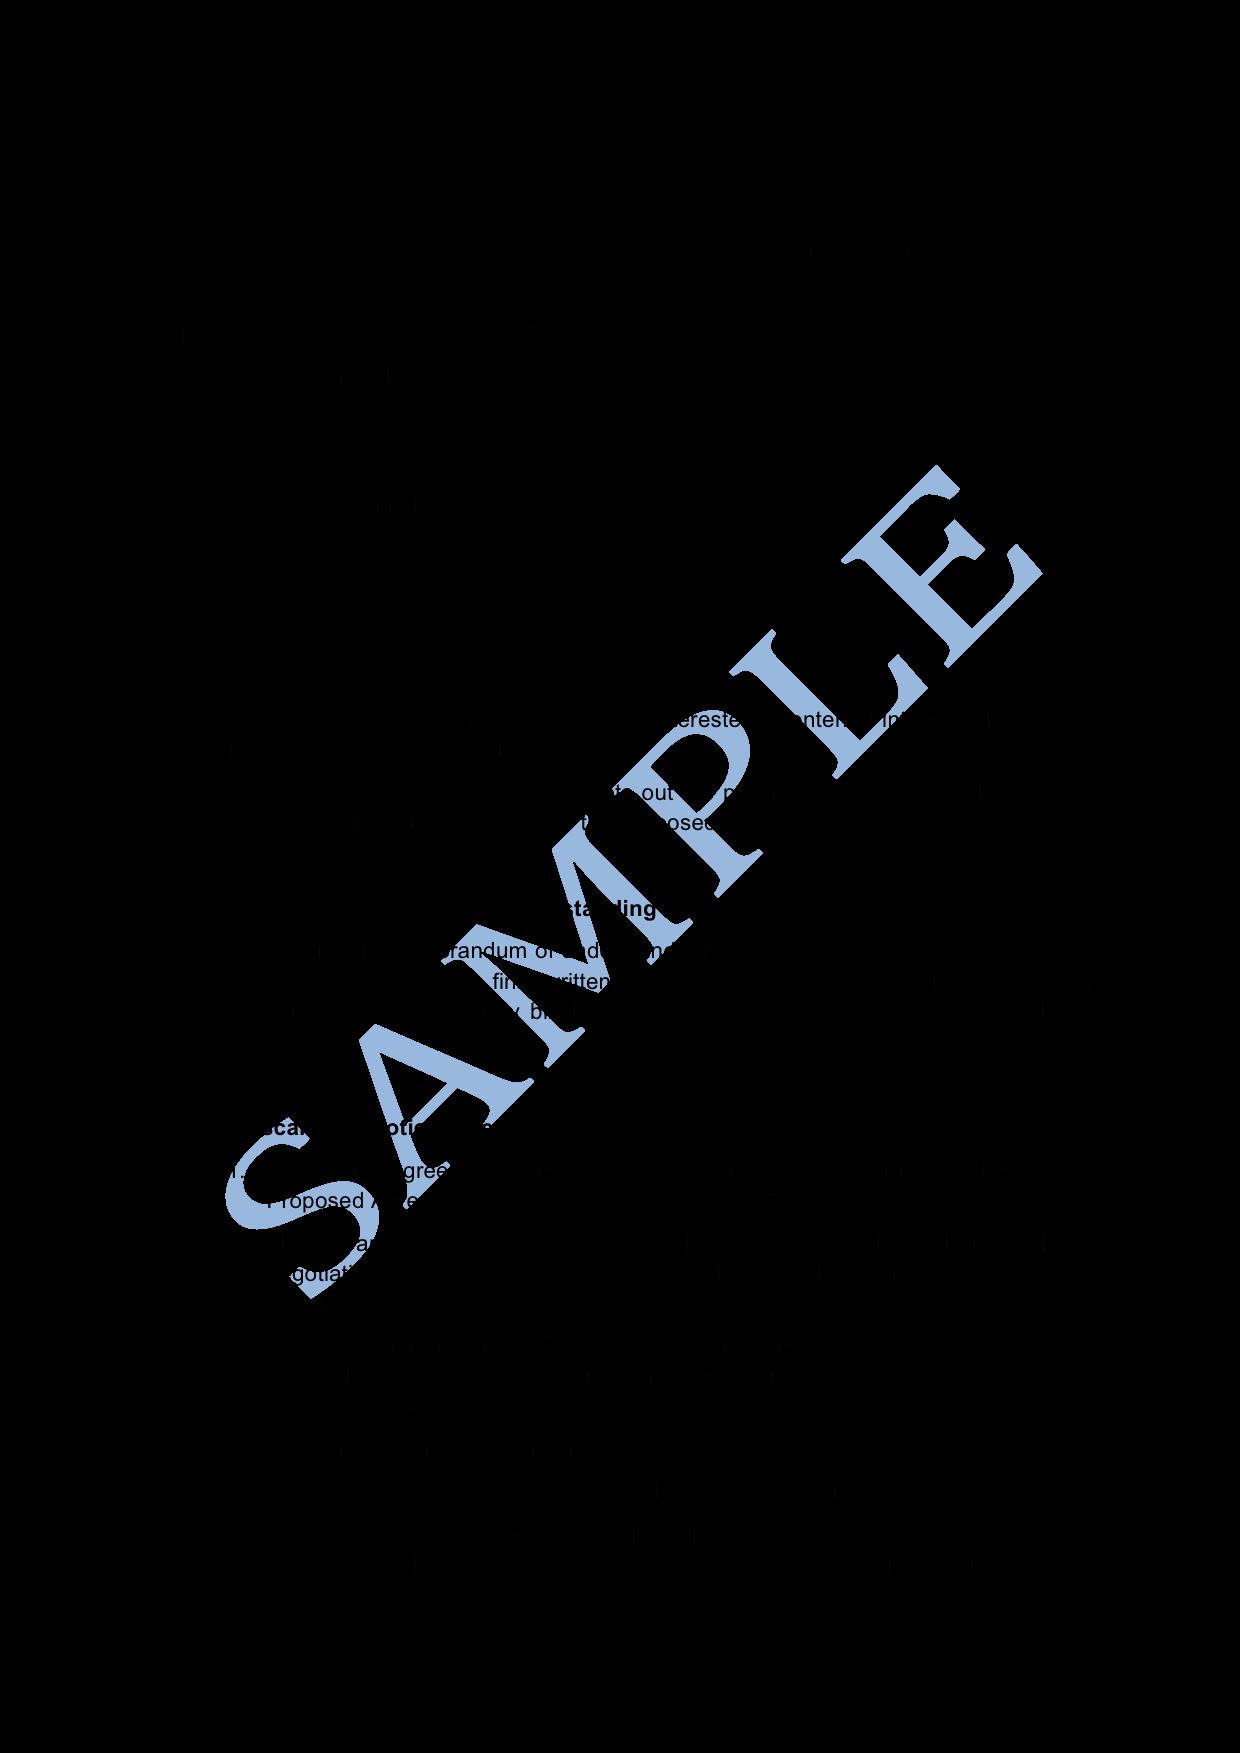 Memorandum Of Understanding Template Beautiful Memorandum Of Understanding Sample Lawpath